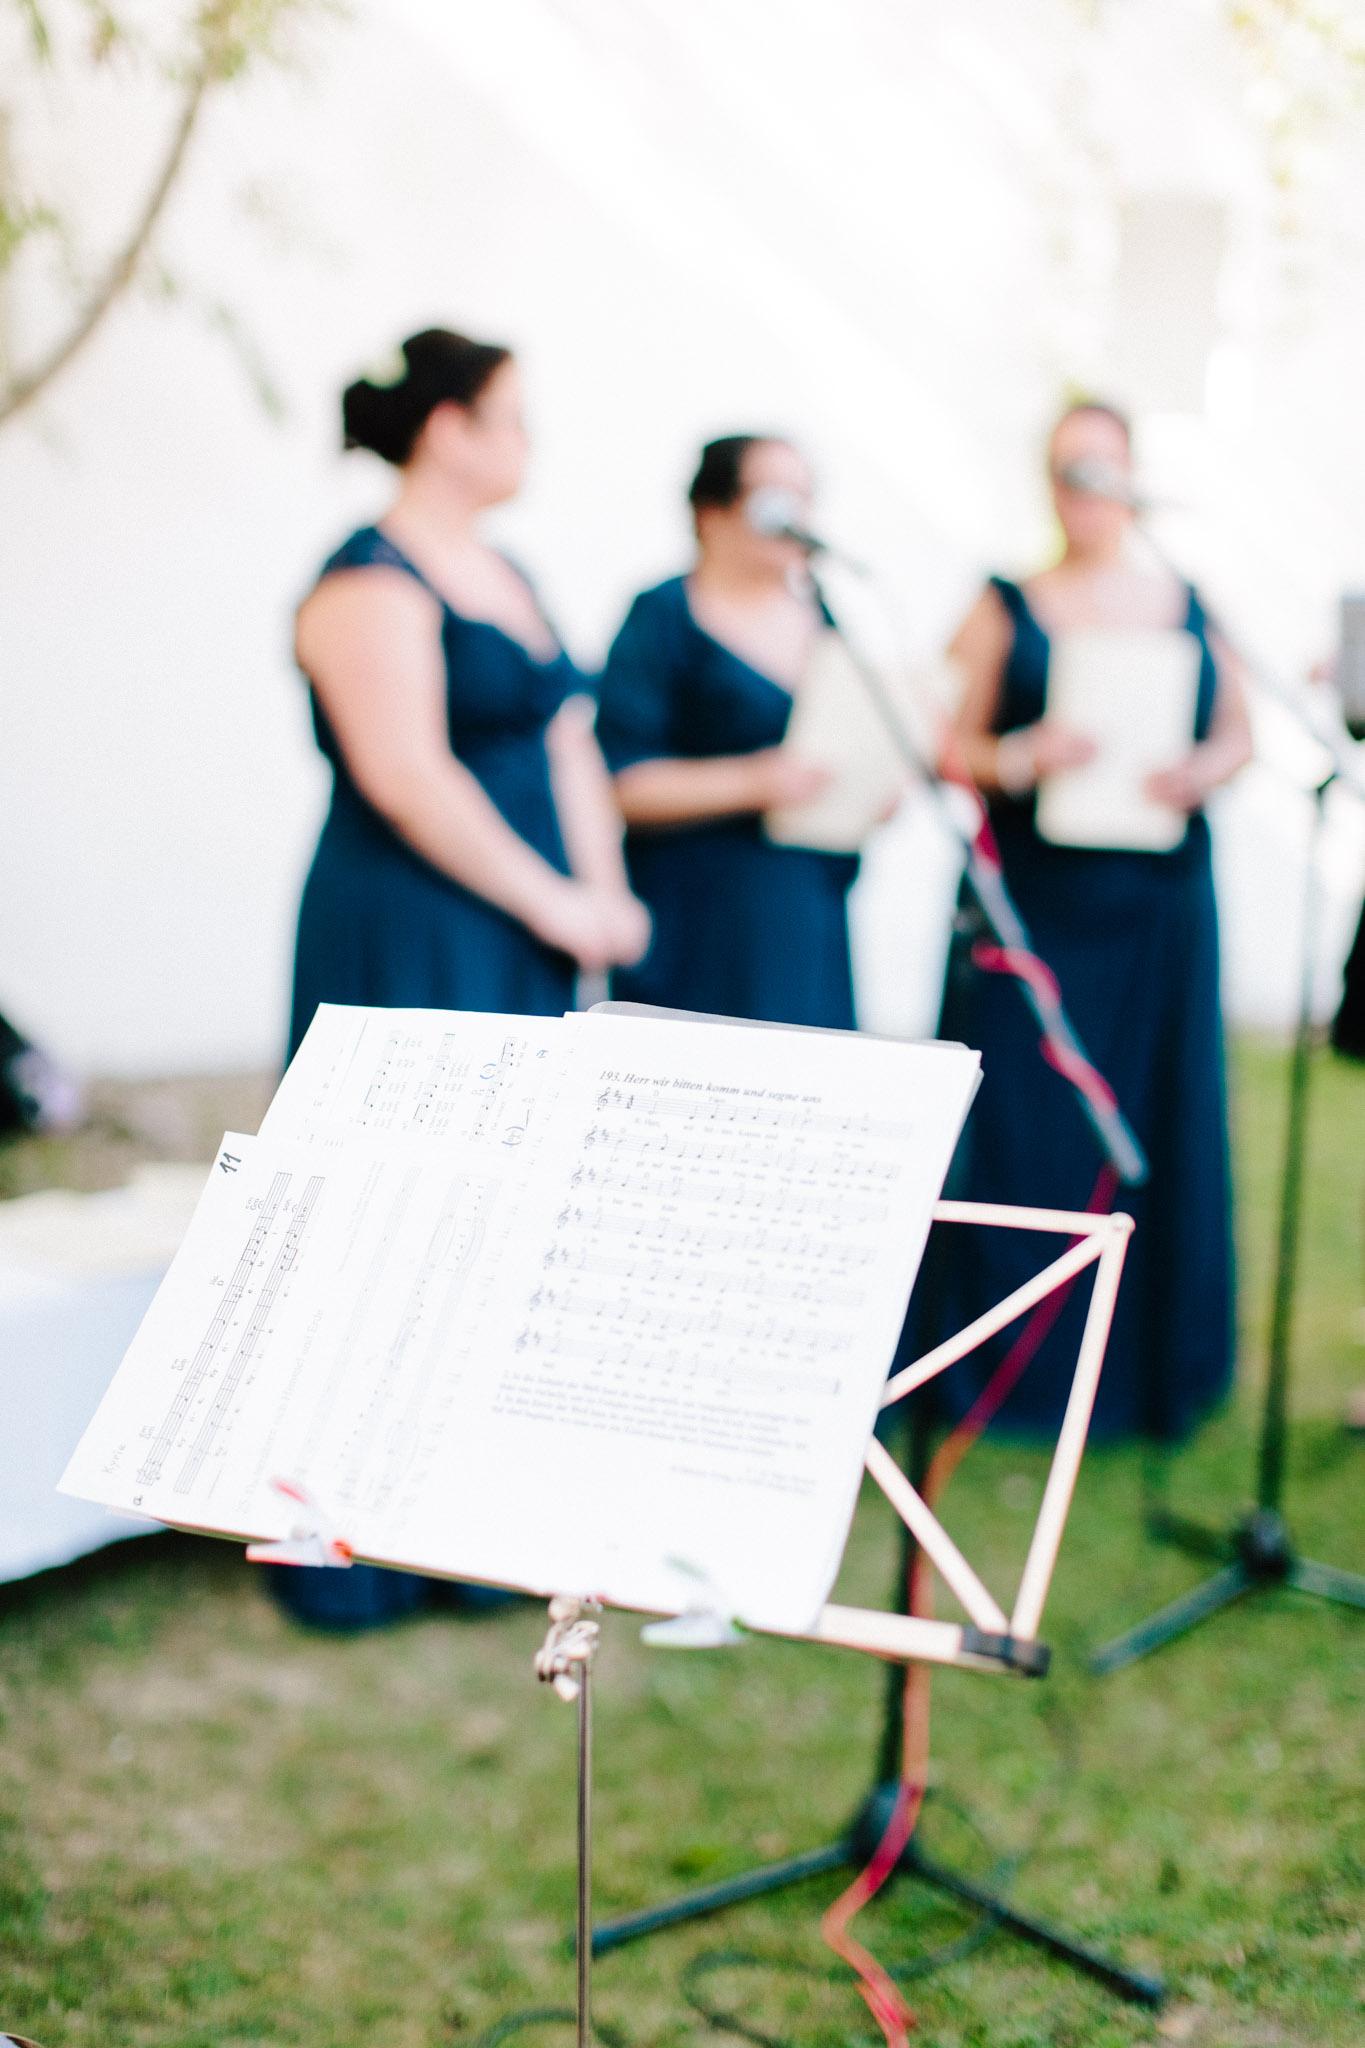 Lilienhof-Freiburg-Hochzeit-Pia-Anna-Christian-Wedding-Photography-FS-57.jpg